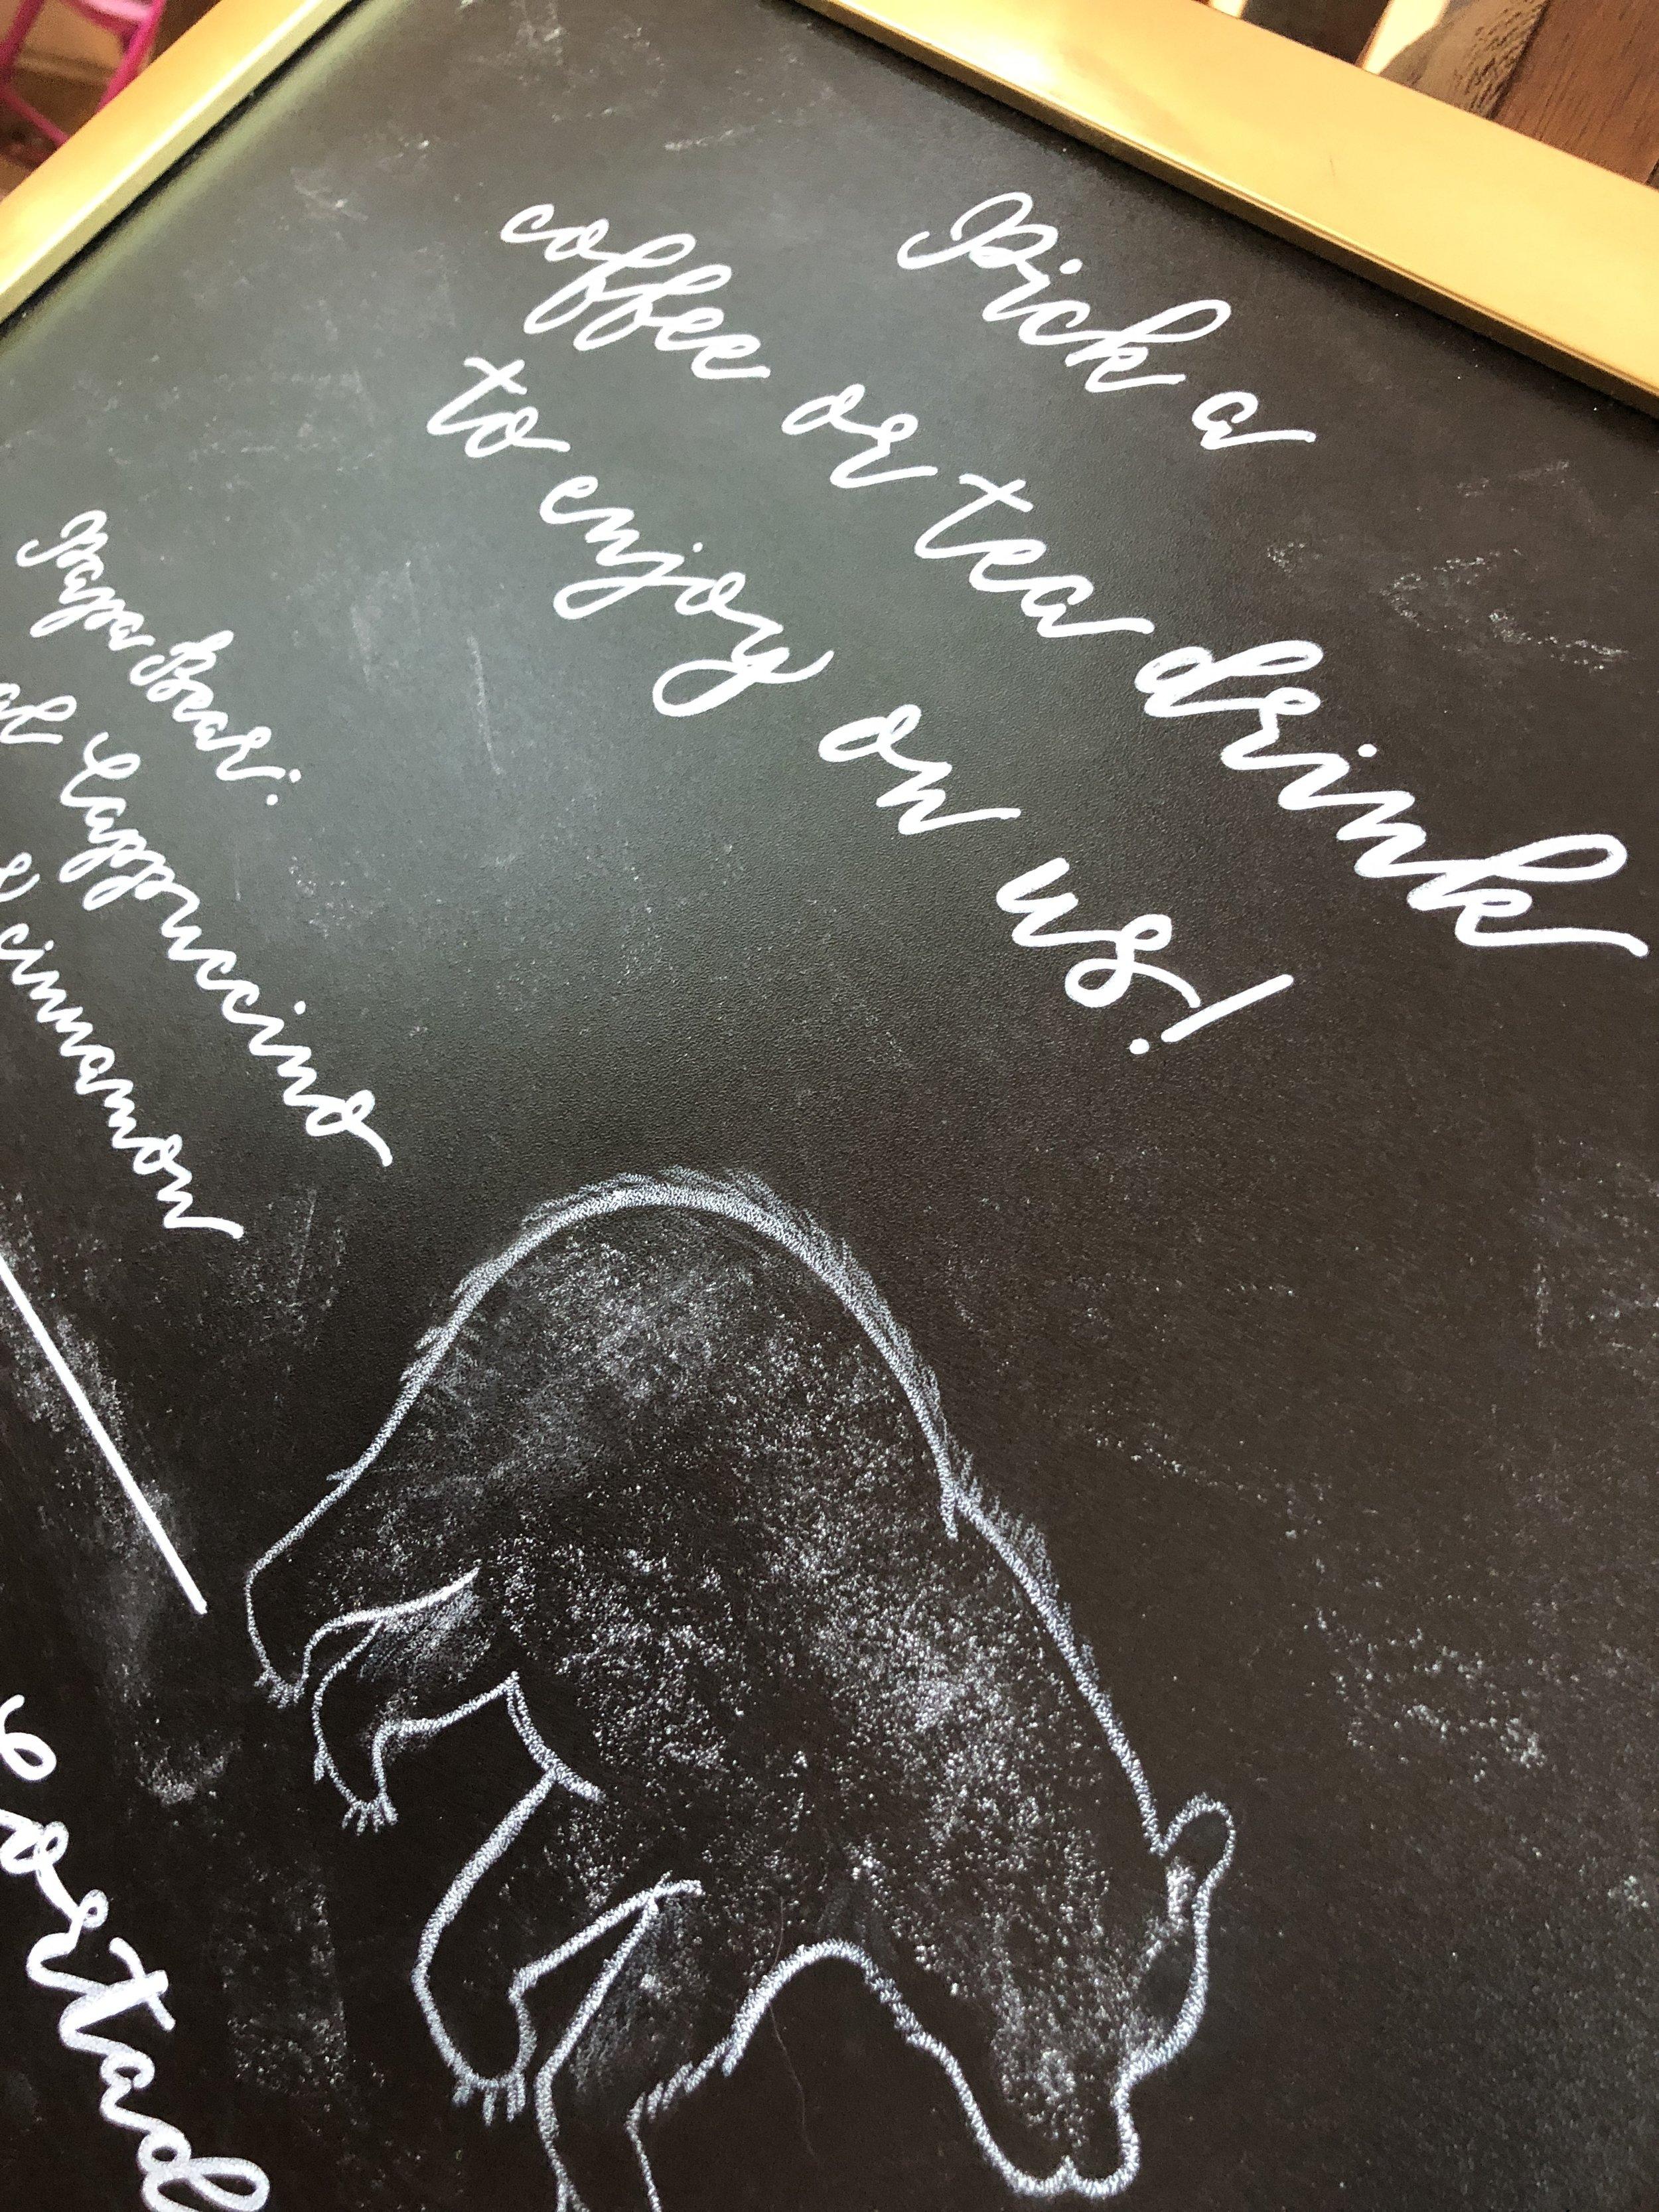 Central PA, York PA, JesSmith Designs, custom, wedding, invitations, bridal, announcements, save the date, birth, baby, motherhood, hanover, calligraphy, handlettering, wedding invitations, lancaster, gettysburg-10-14 09.39.55.jpg